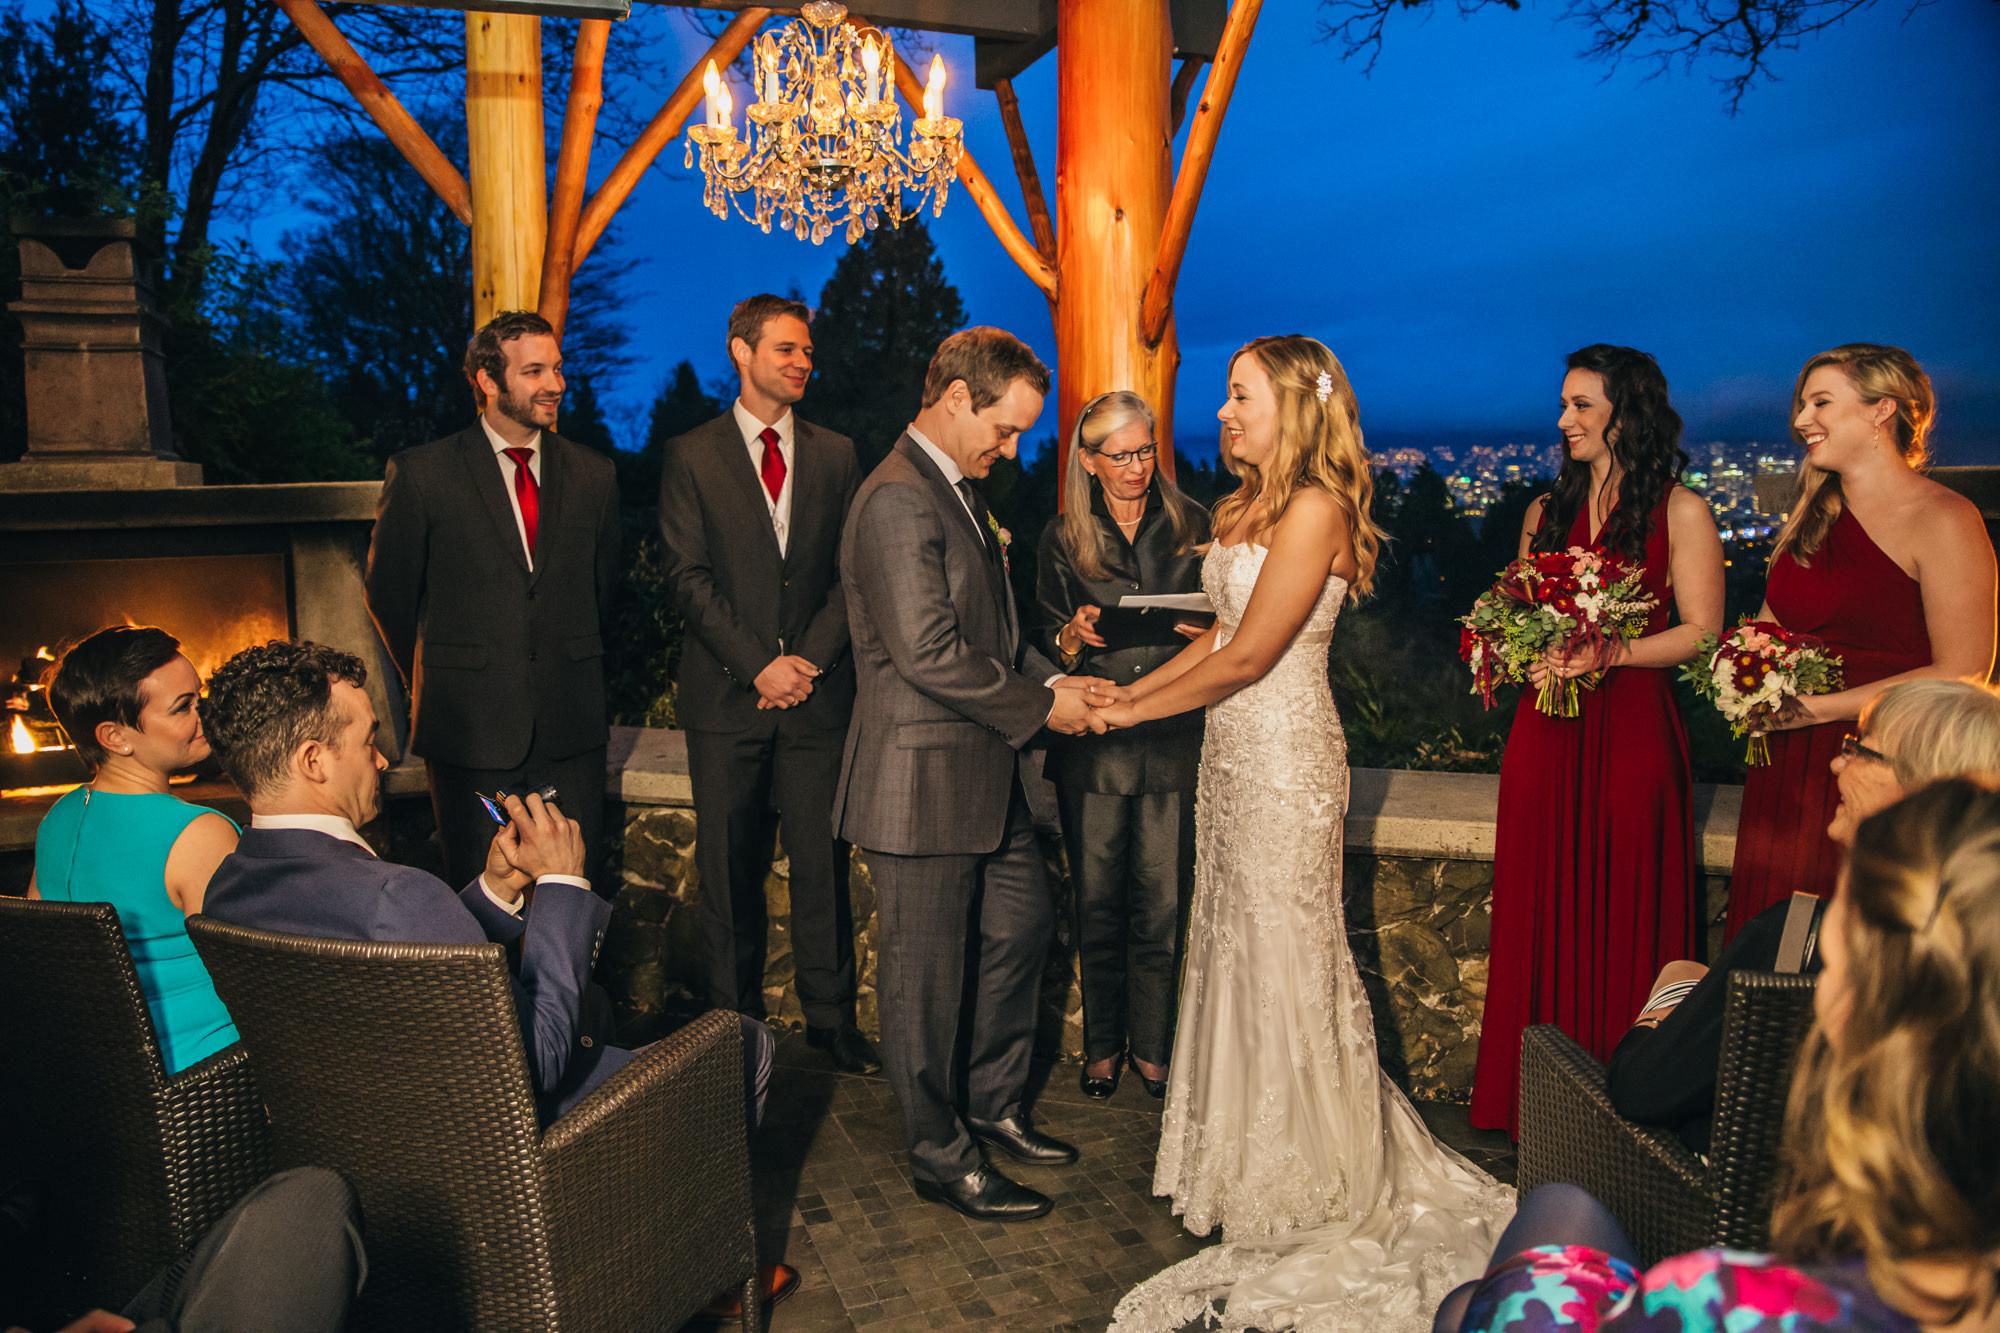 25-seasons-in-the-park-wedding-ceremony.jpg